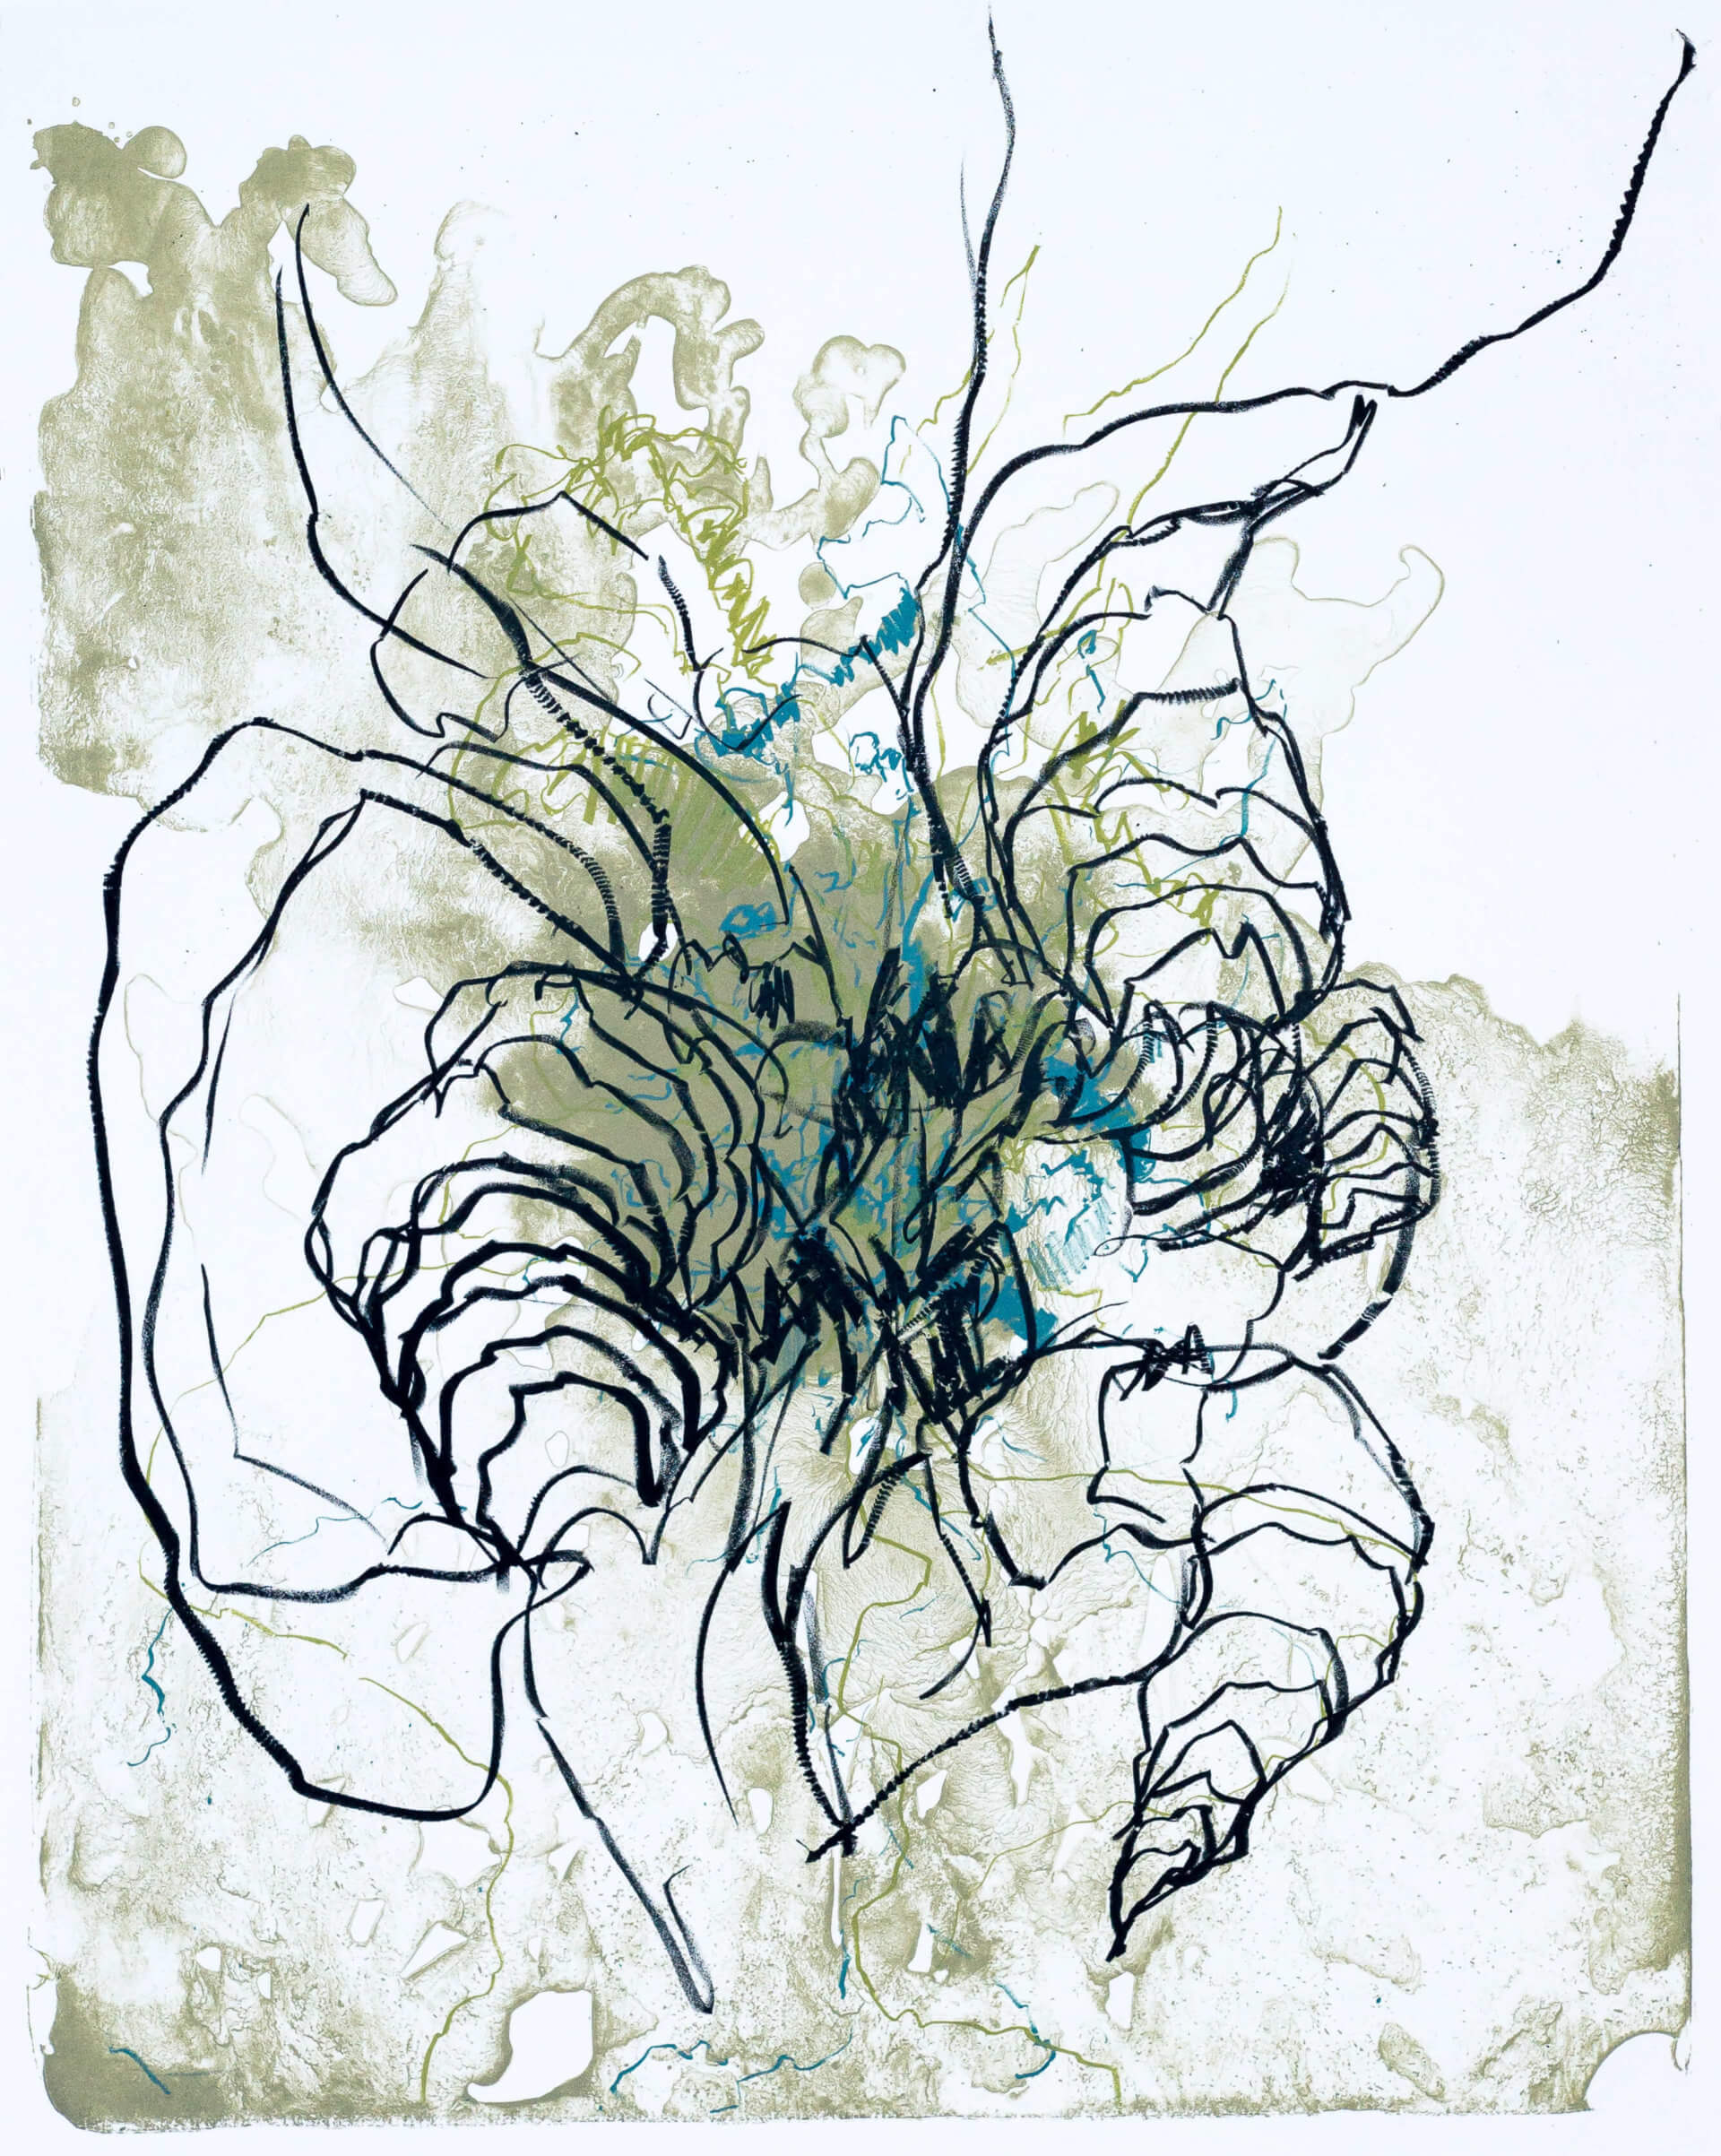 Katharina Albers, organism (Wald) II, 2016, Farblithographie, Unikat, 50x40 cm